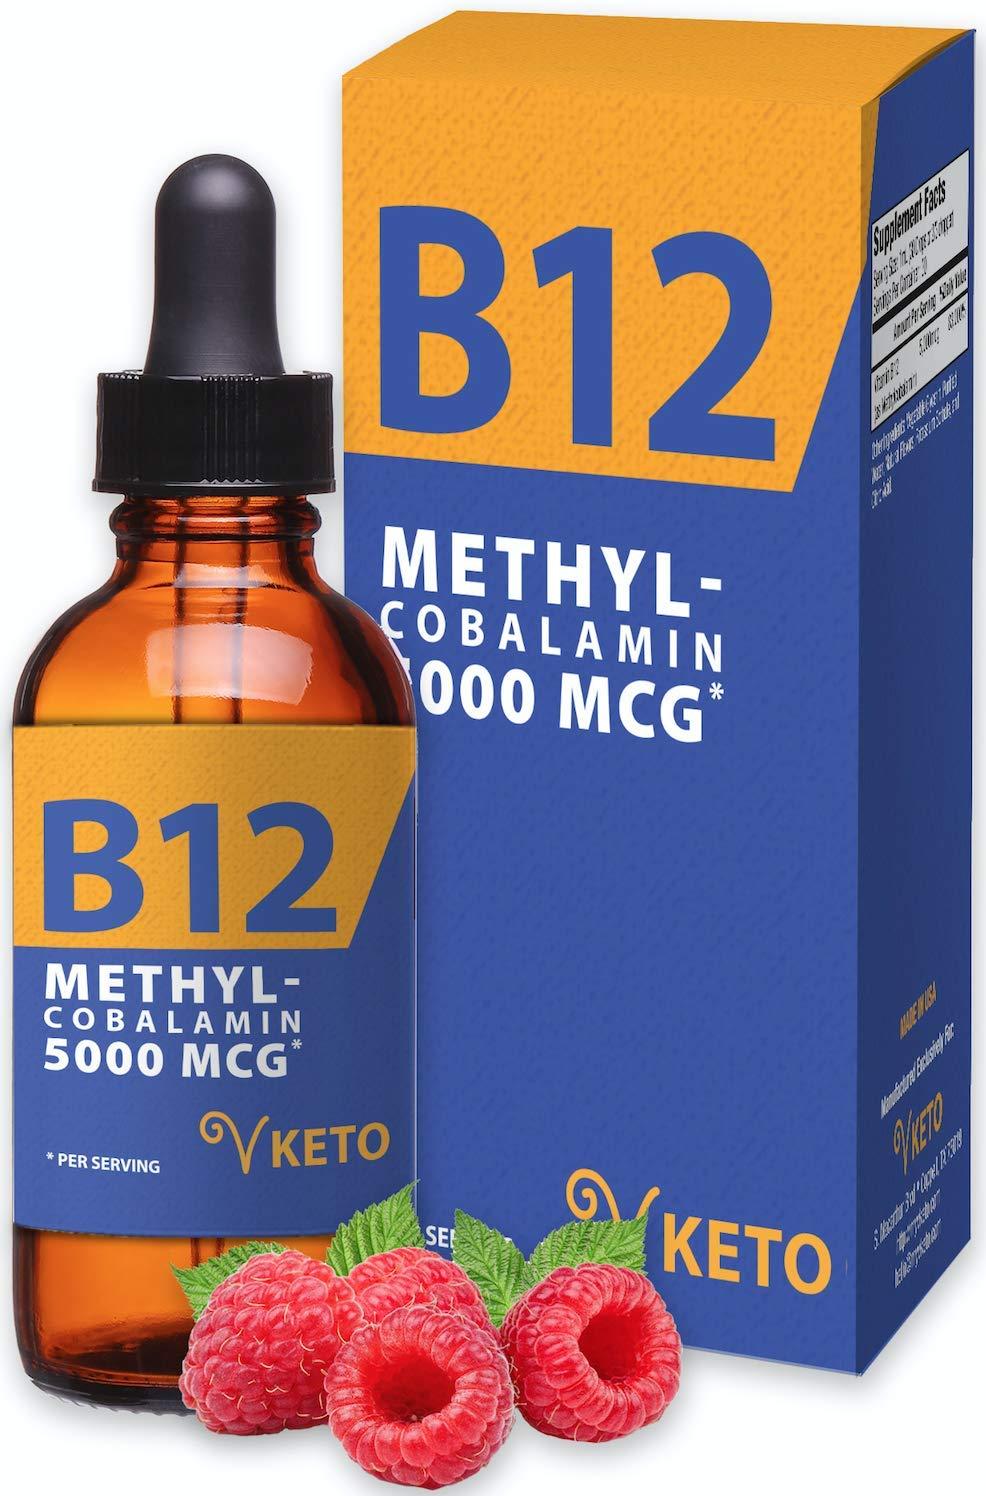 Vitamin B12 Sublingual Liquid Methyl B12 - Extra Strength 5000mcg Methylcobalamin - Organic, Vegan, Keto Liposomal Energy Drops